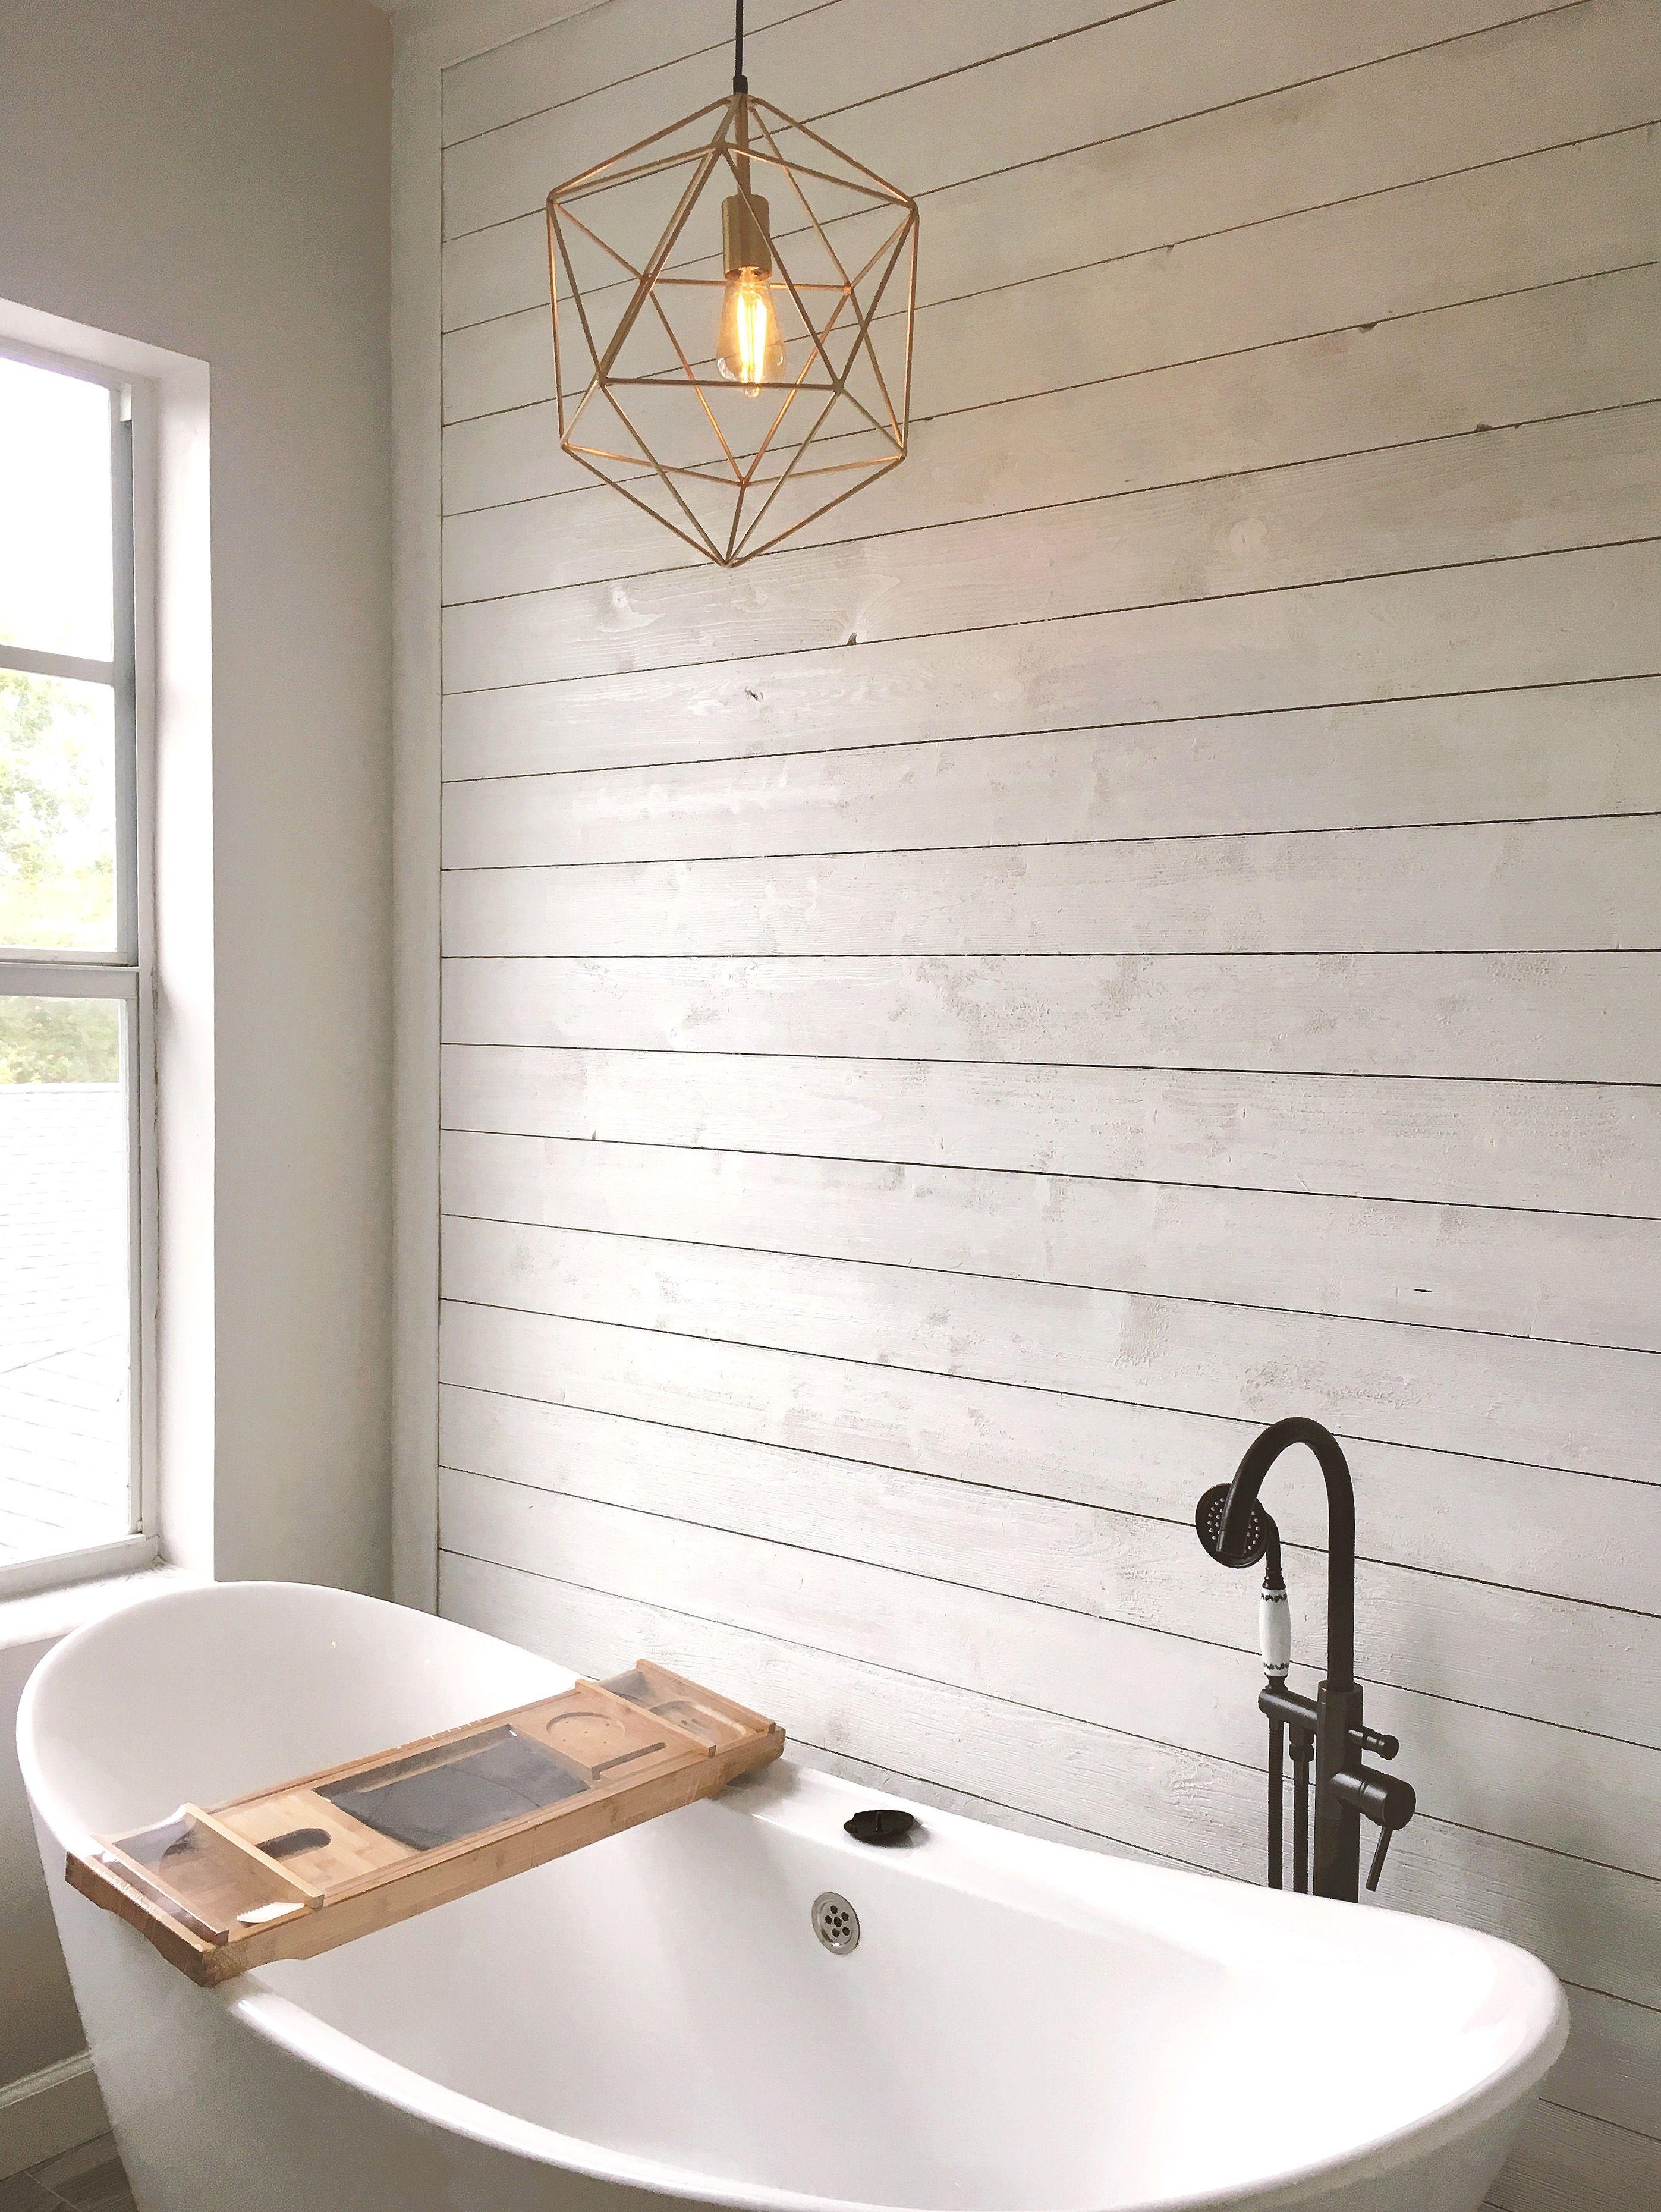 Geometric Pendant Light Stand Alone Bathtub Stand Alone Bathtubs Farmhouse Bathtubs Modern Farmhouse Bathroom